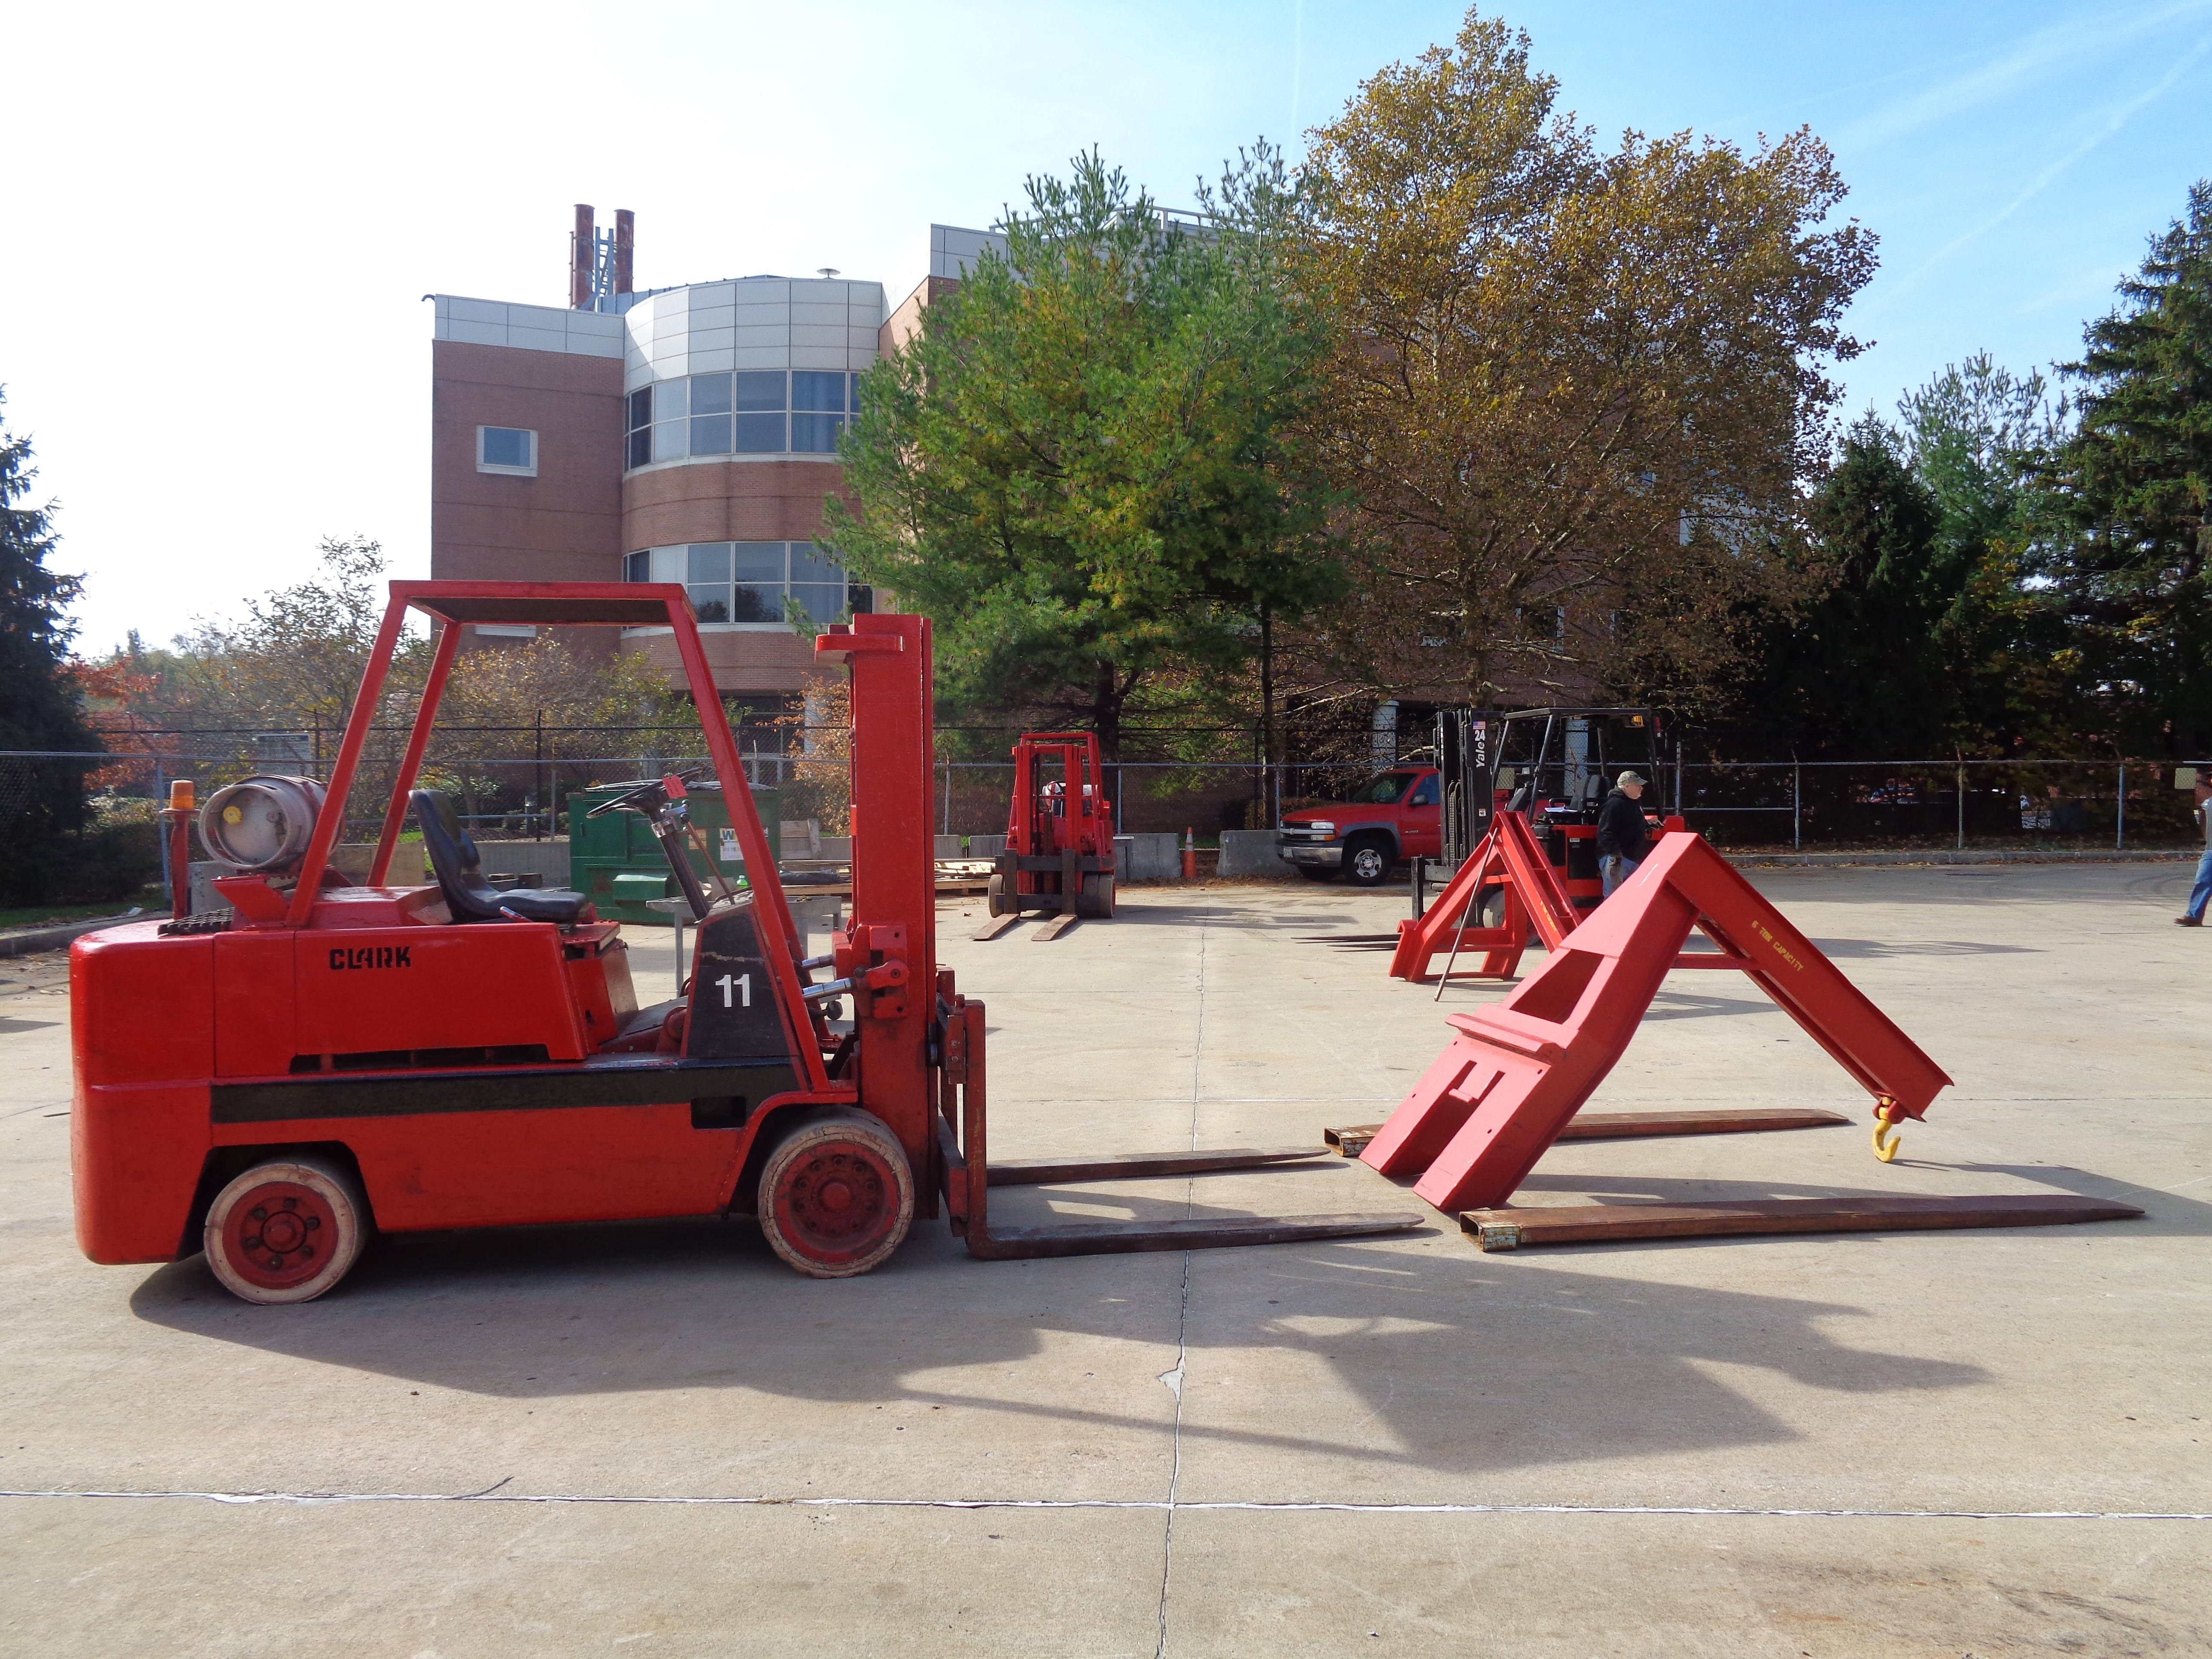 Clark C500-120 Forklift plus boom - 12,000 lbs - Image 6 of 11